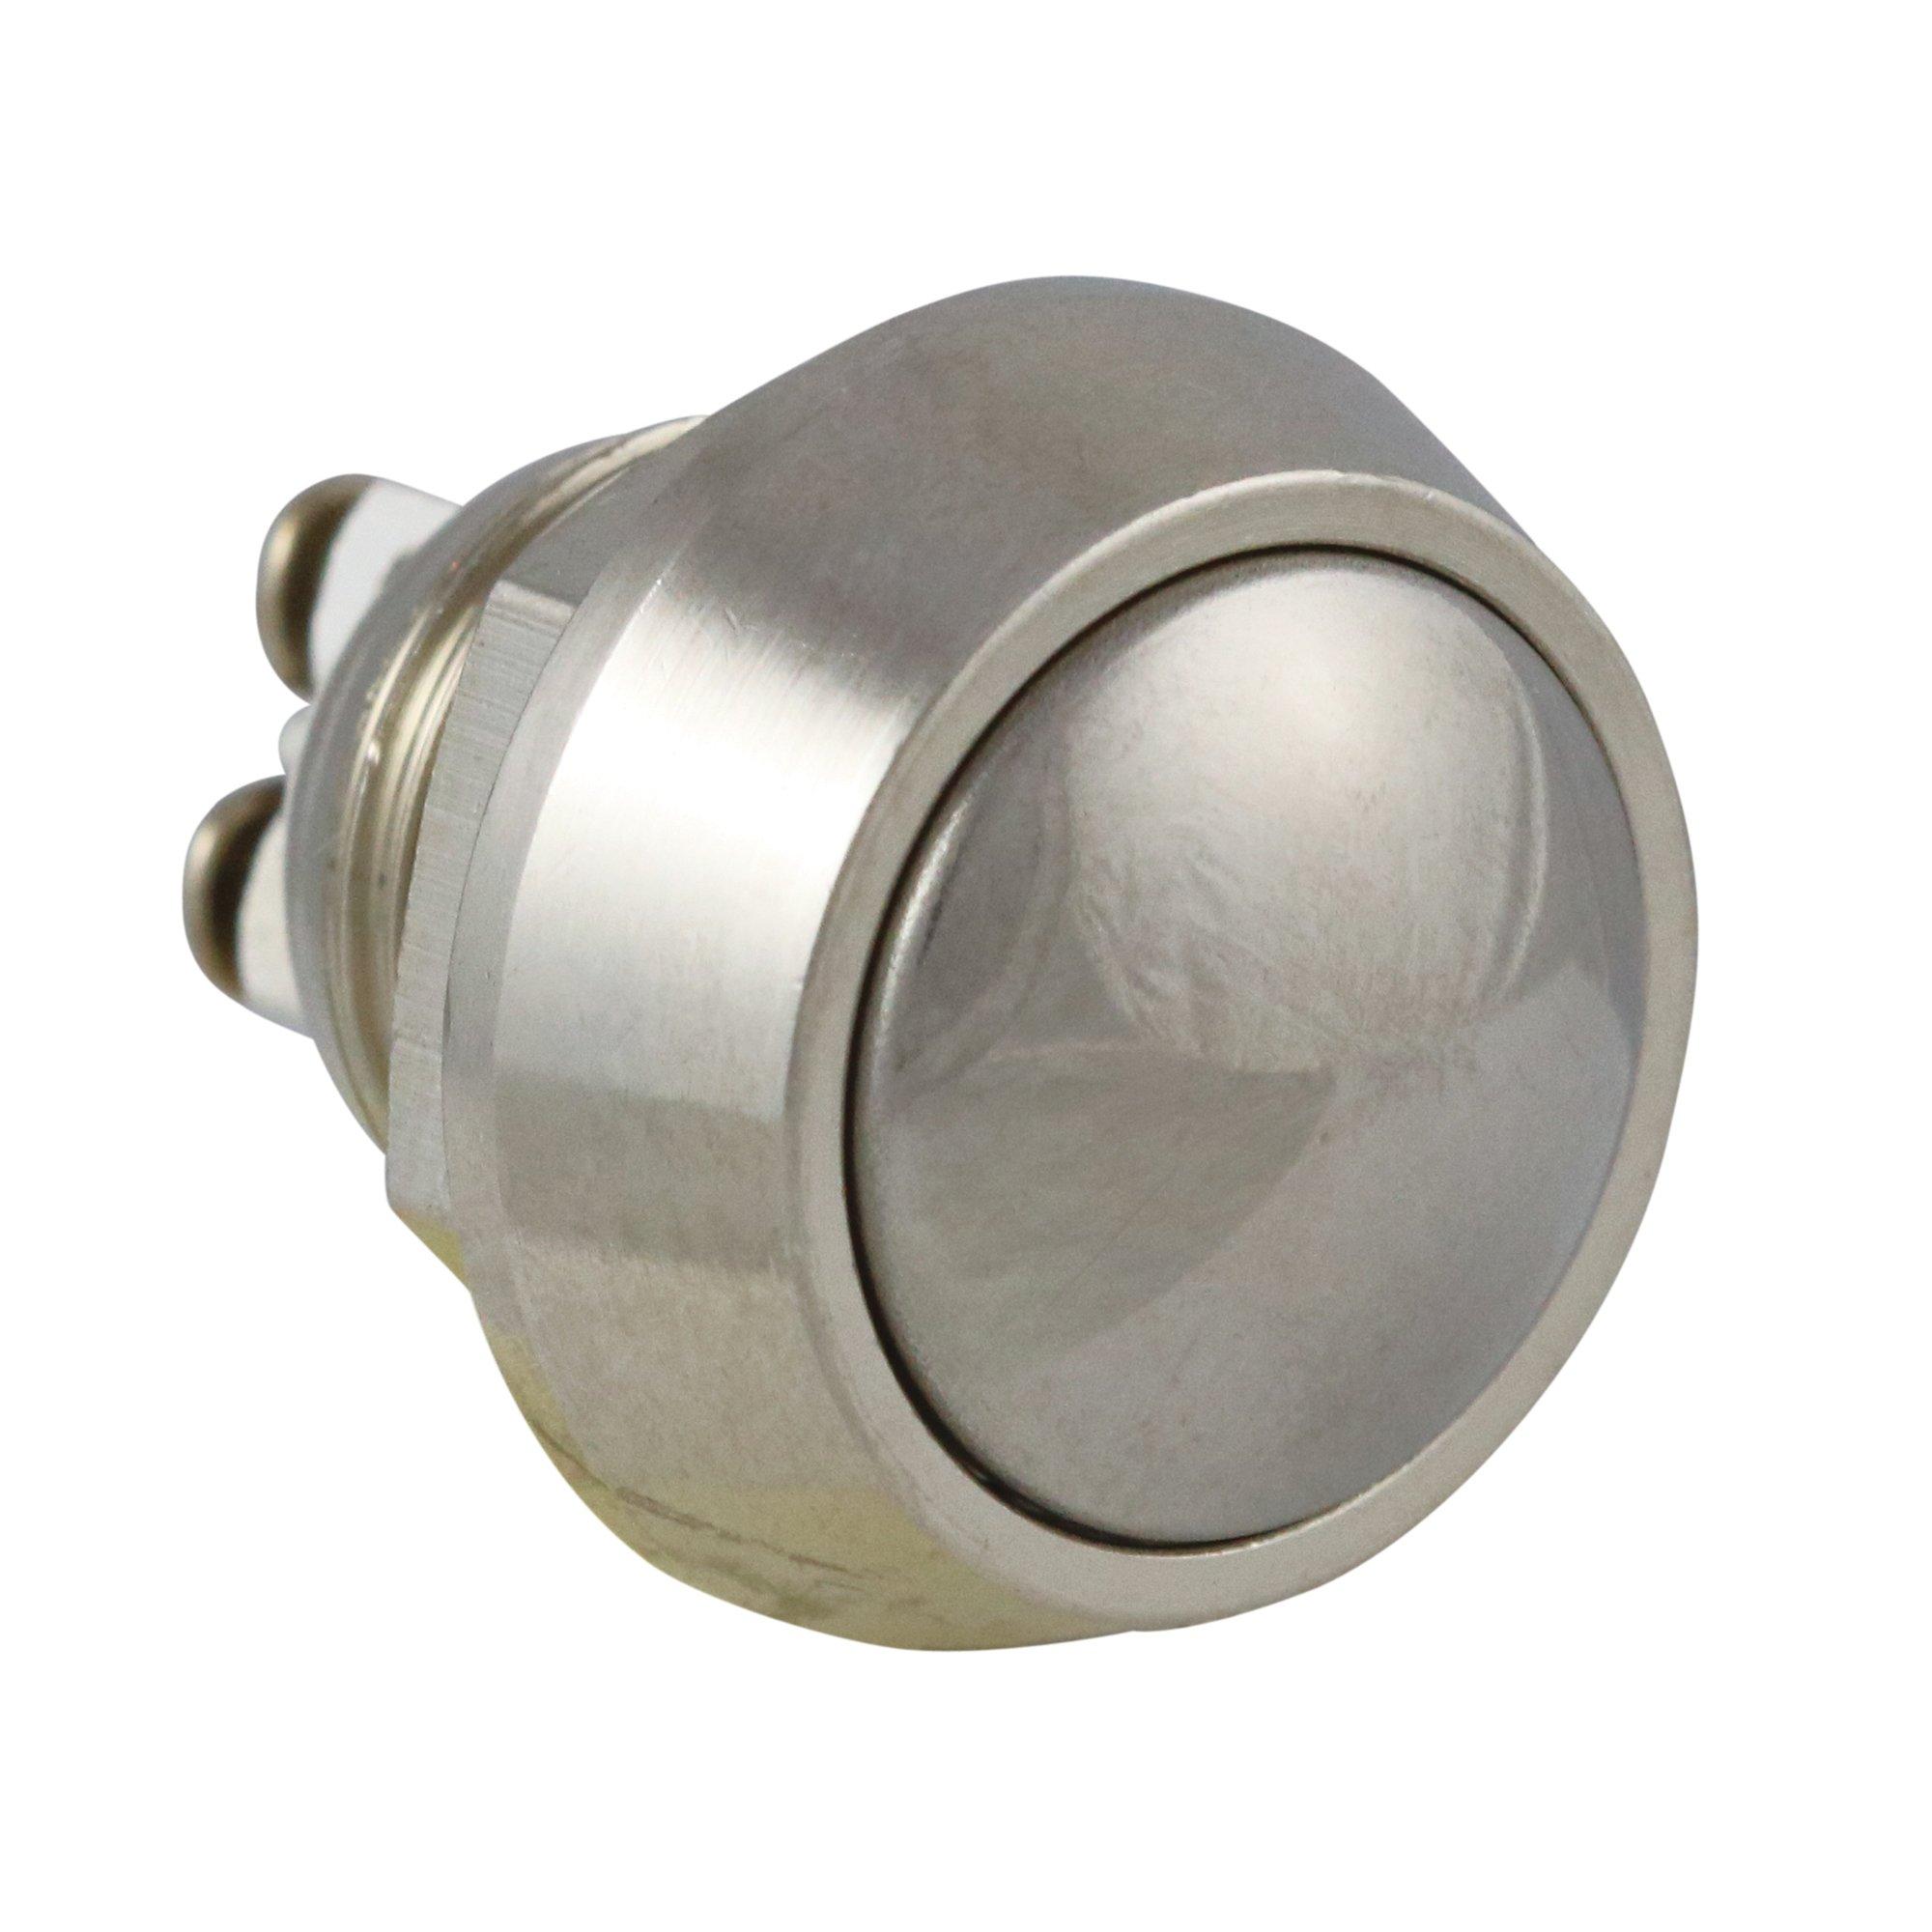 Nickel Push Button Switch - AB-AV-1204